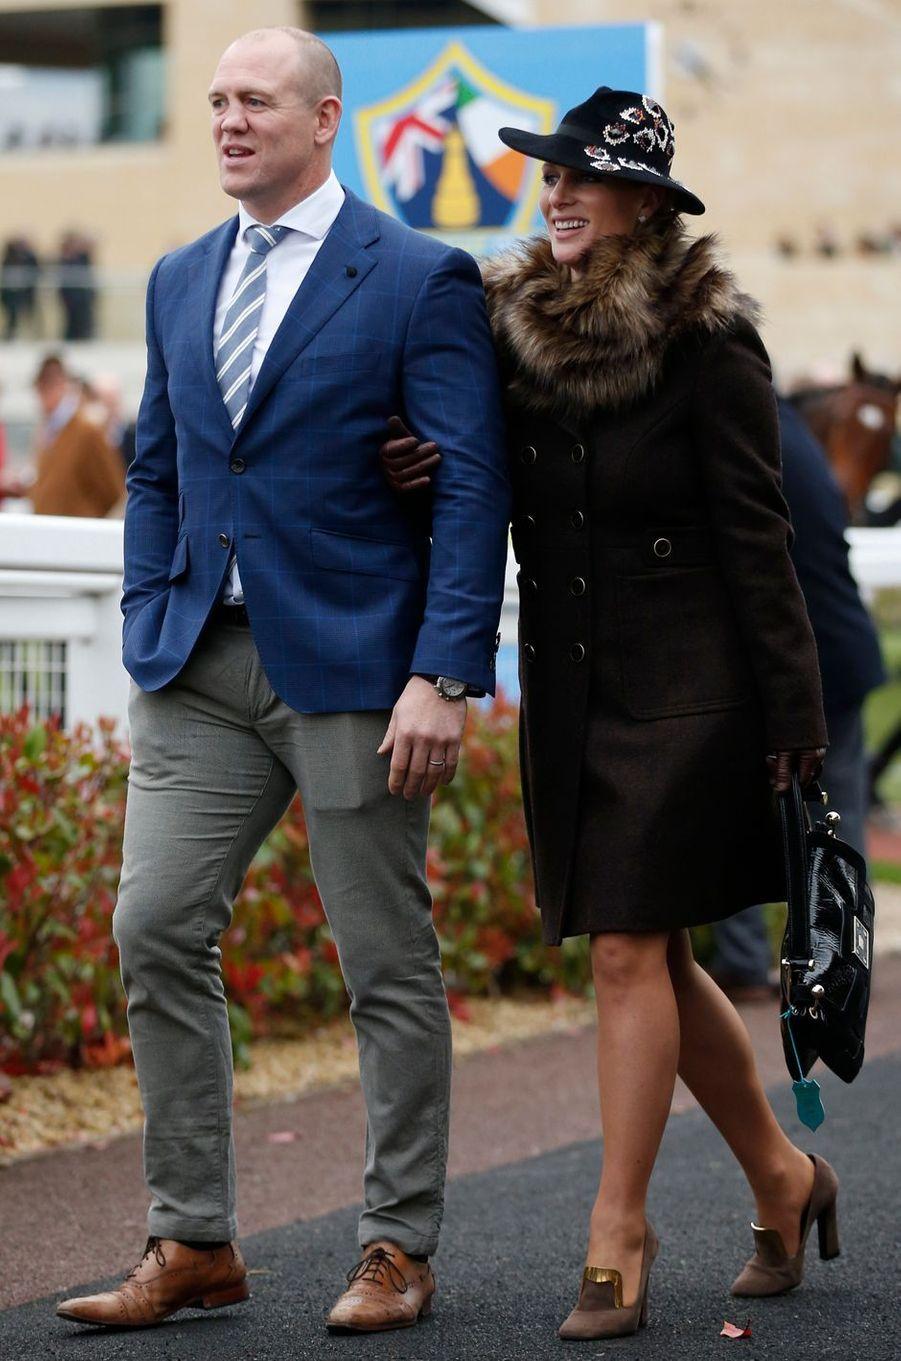 Zara Phillips au Cheltenham Festival avec son mari Mike Tindall, le 16 mars 2017